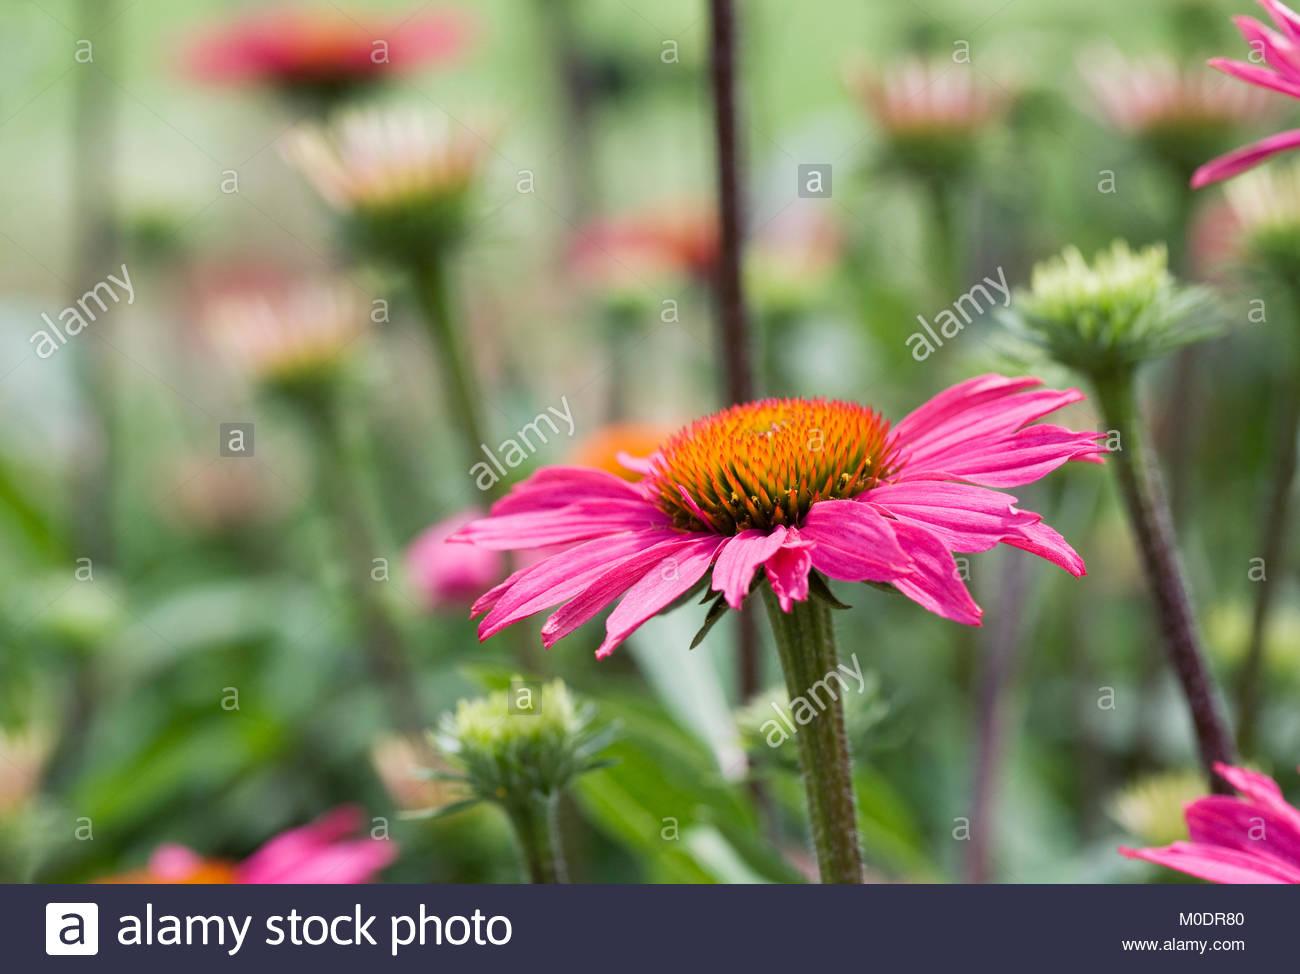 Echinacea purpurea 'Pink Shimmer' flowers. - Stock Image